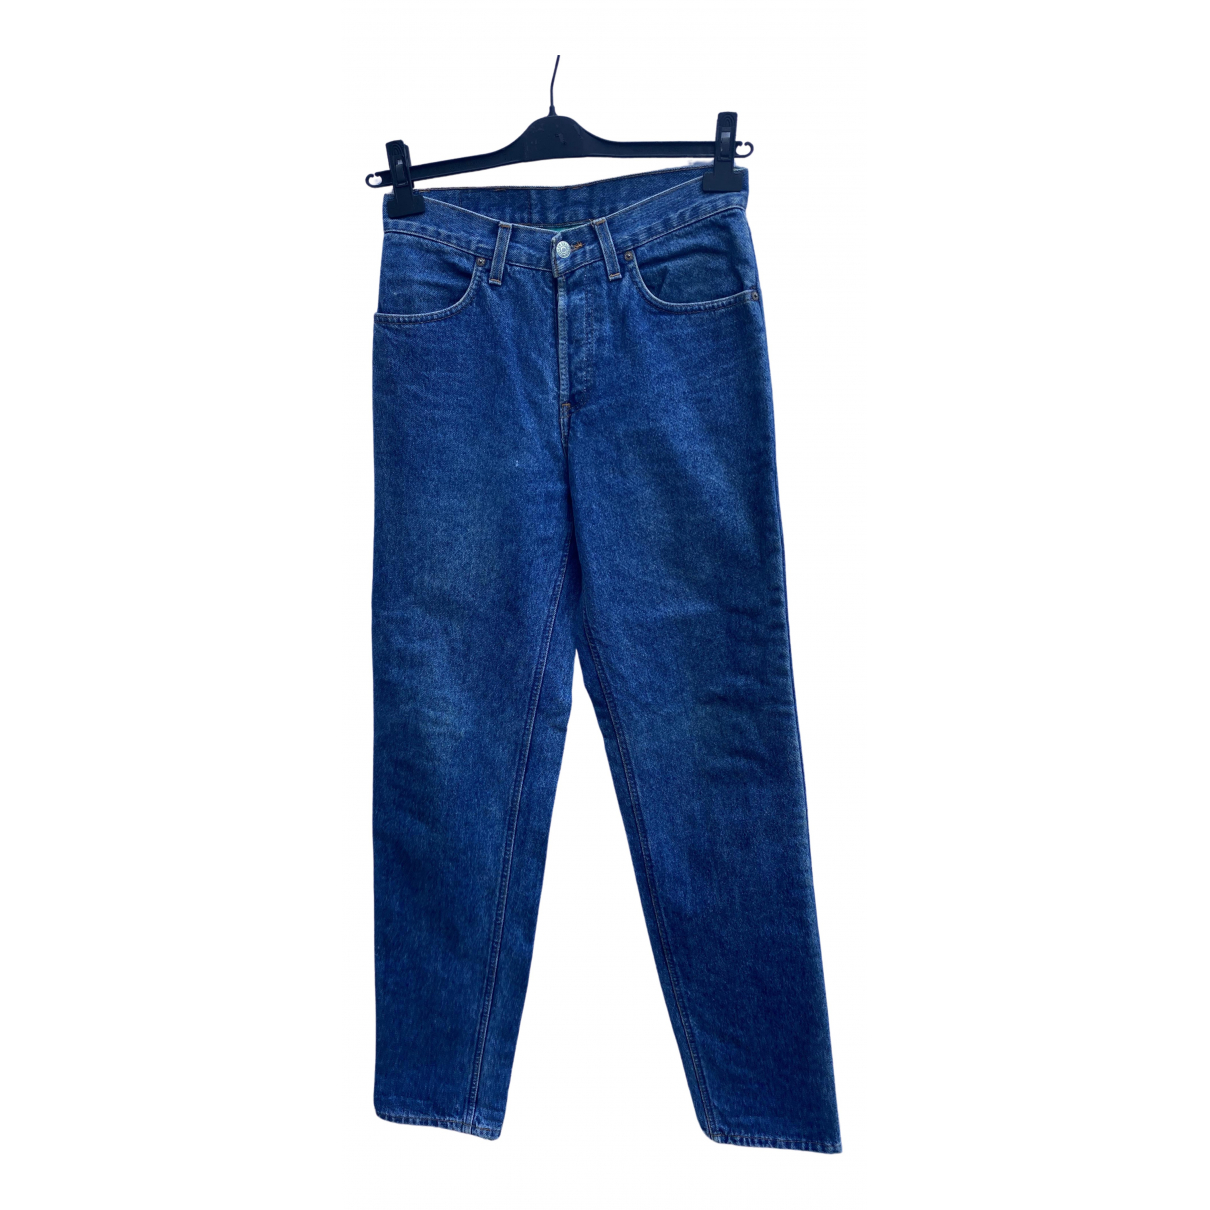 Levi's Vintage Clothing \N Blue Cotton Jeans for Women 35 FR